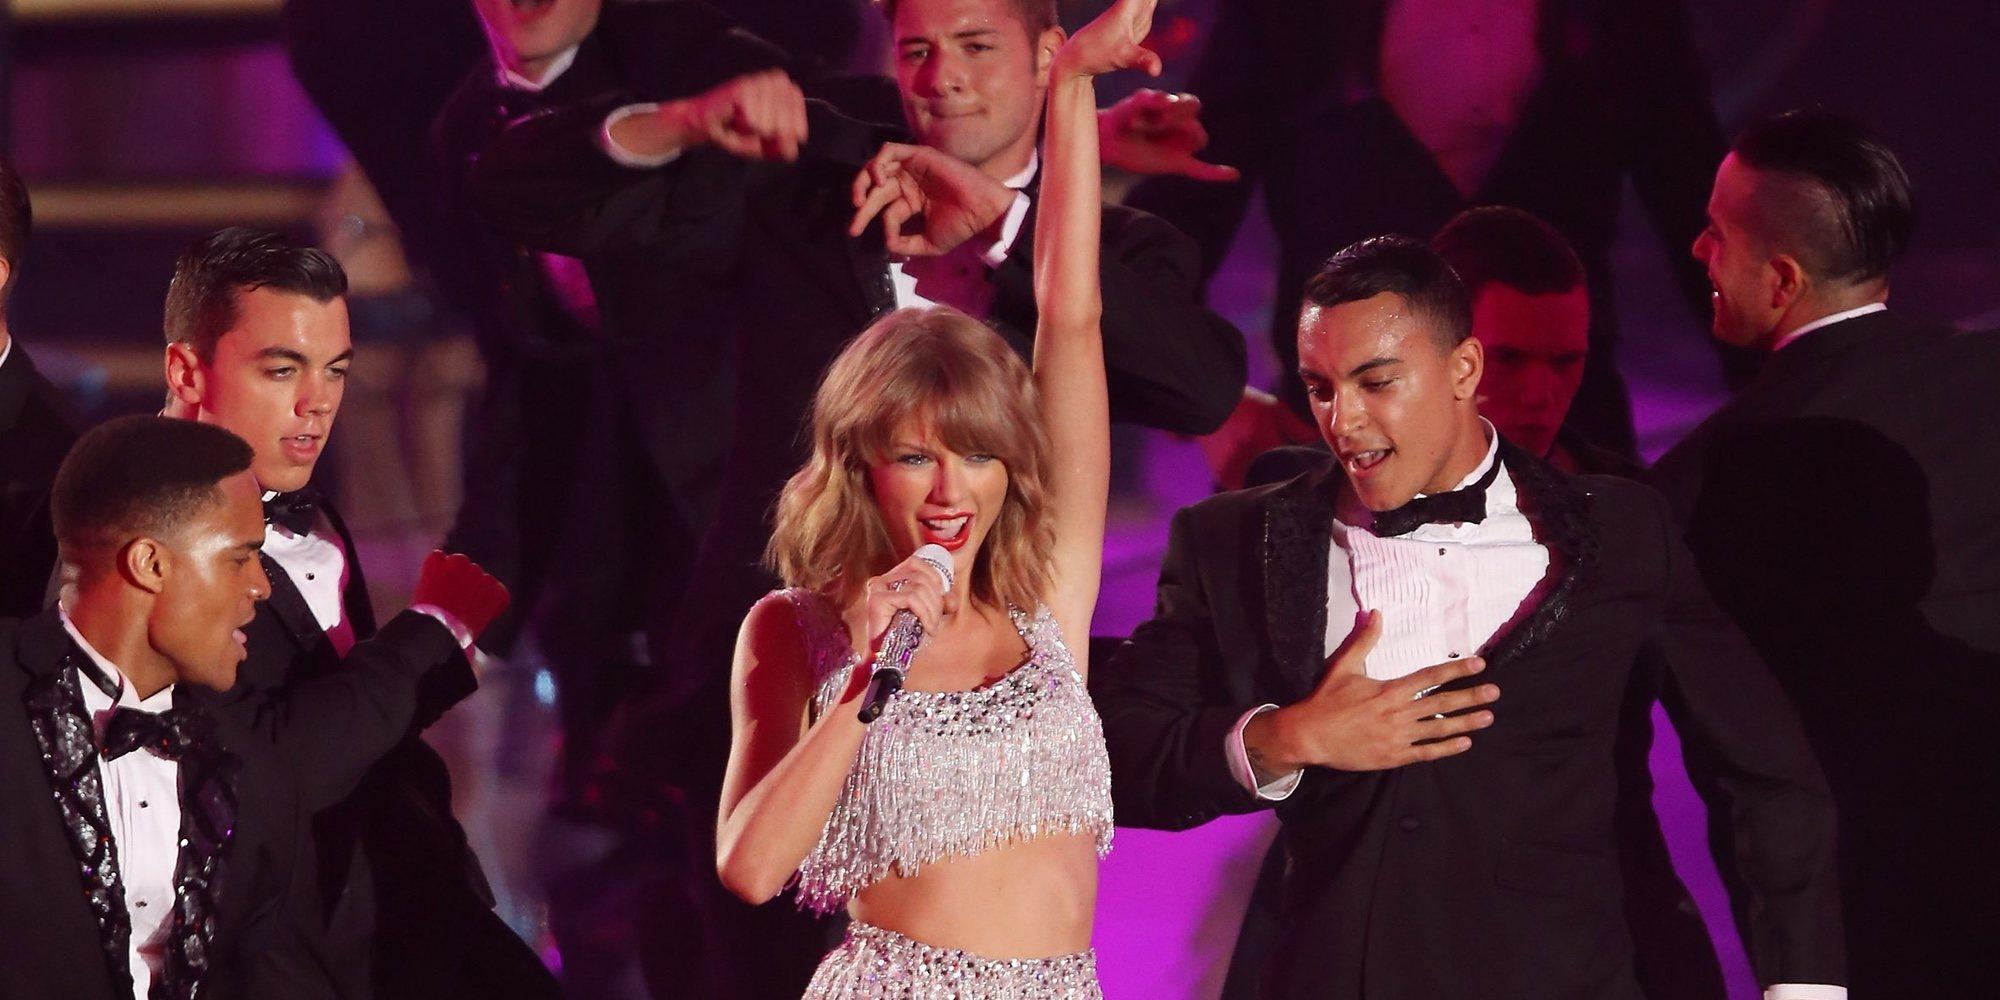 Taylor Swift, la celebrity mejor pagada del mundo superando a Kylie Jenner y a Kanye West